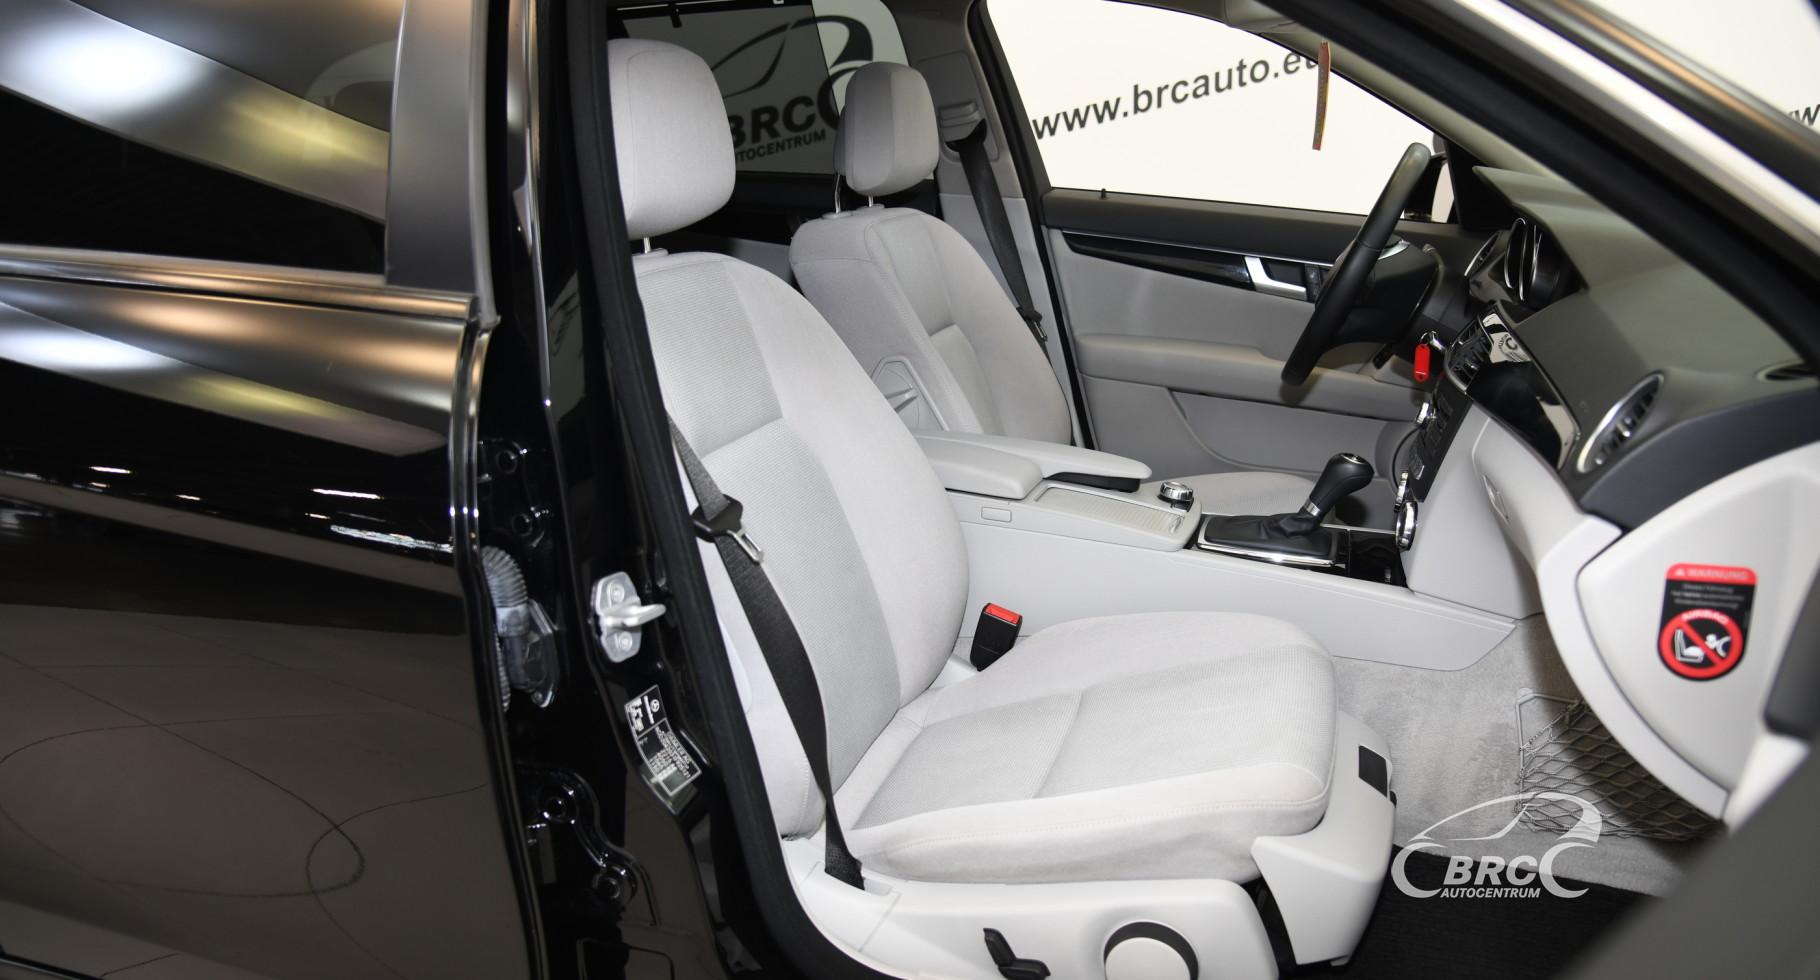 Mercedes-Benz C 250 CDI Classic BlueEFFICIENCY Automatas